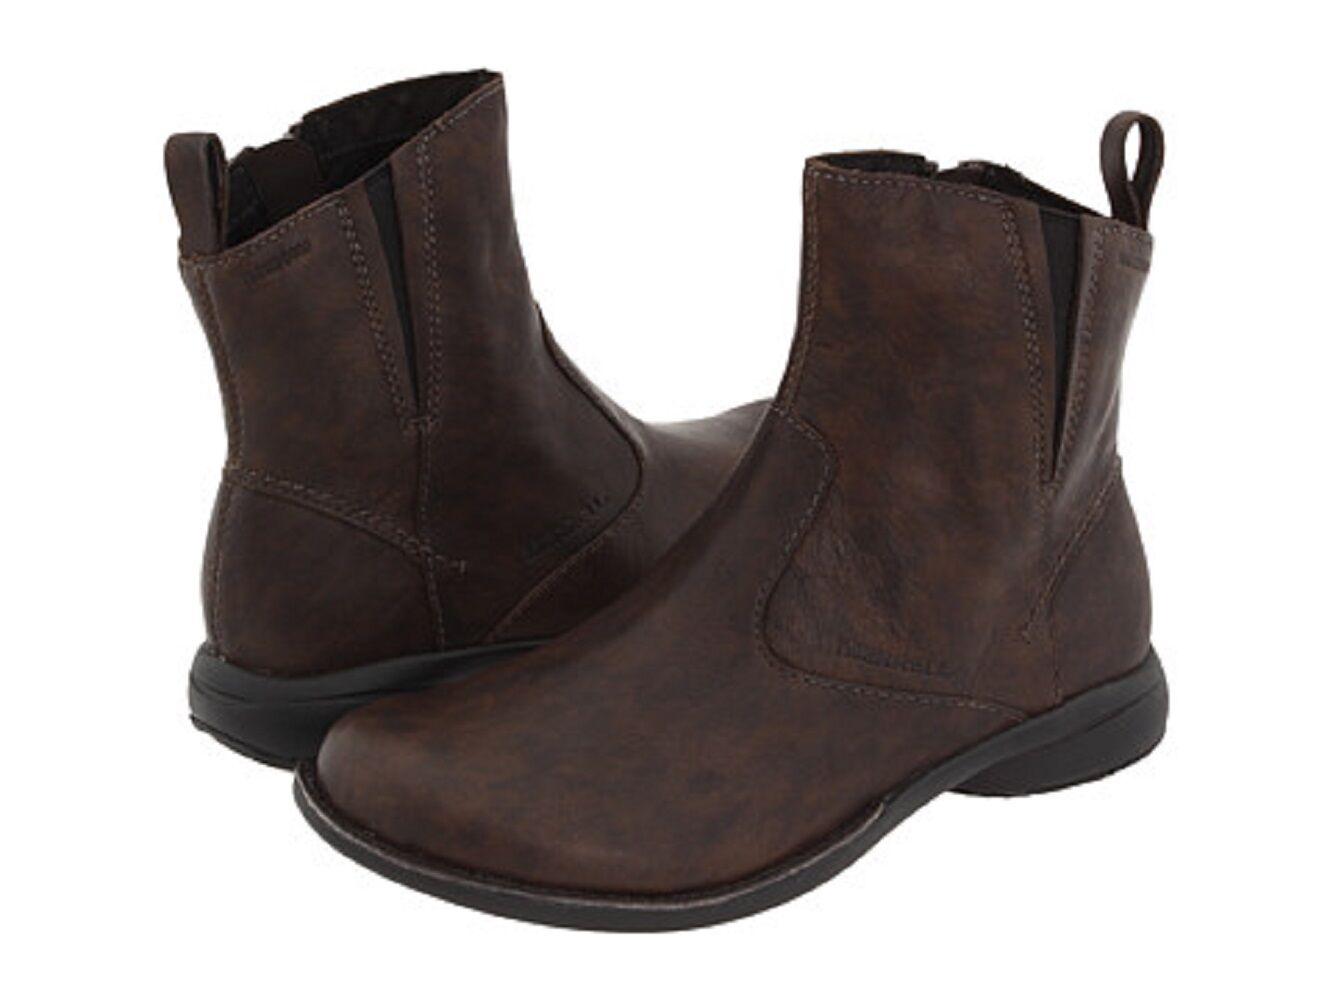 Damenschuhe Größe 5 MERRELL Ankle Tetra Catch Waterproof Leder Ankle MERRELL Stiefel Dark Braun 0a1fb3